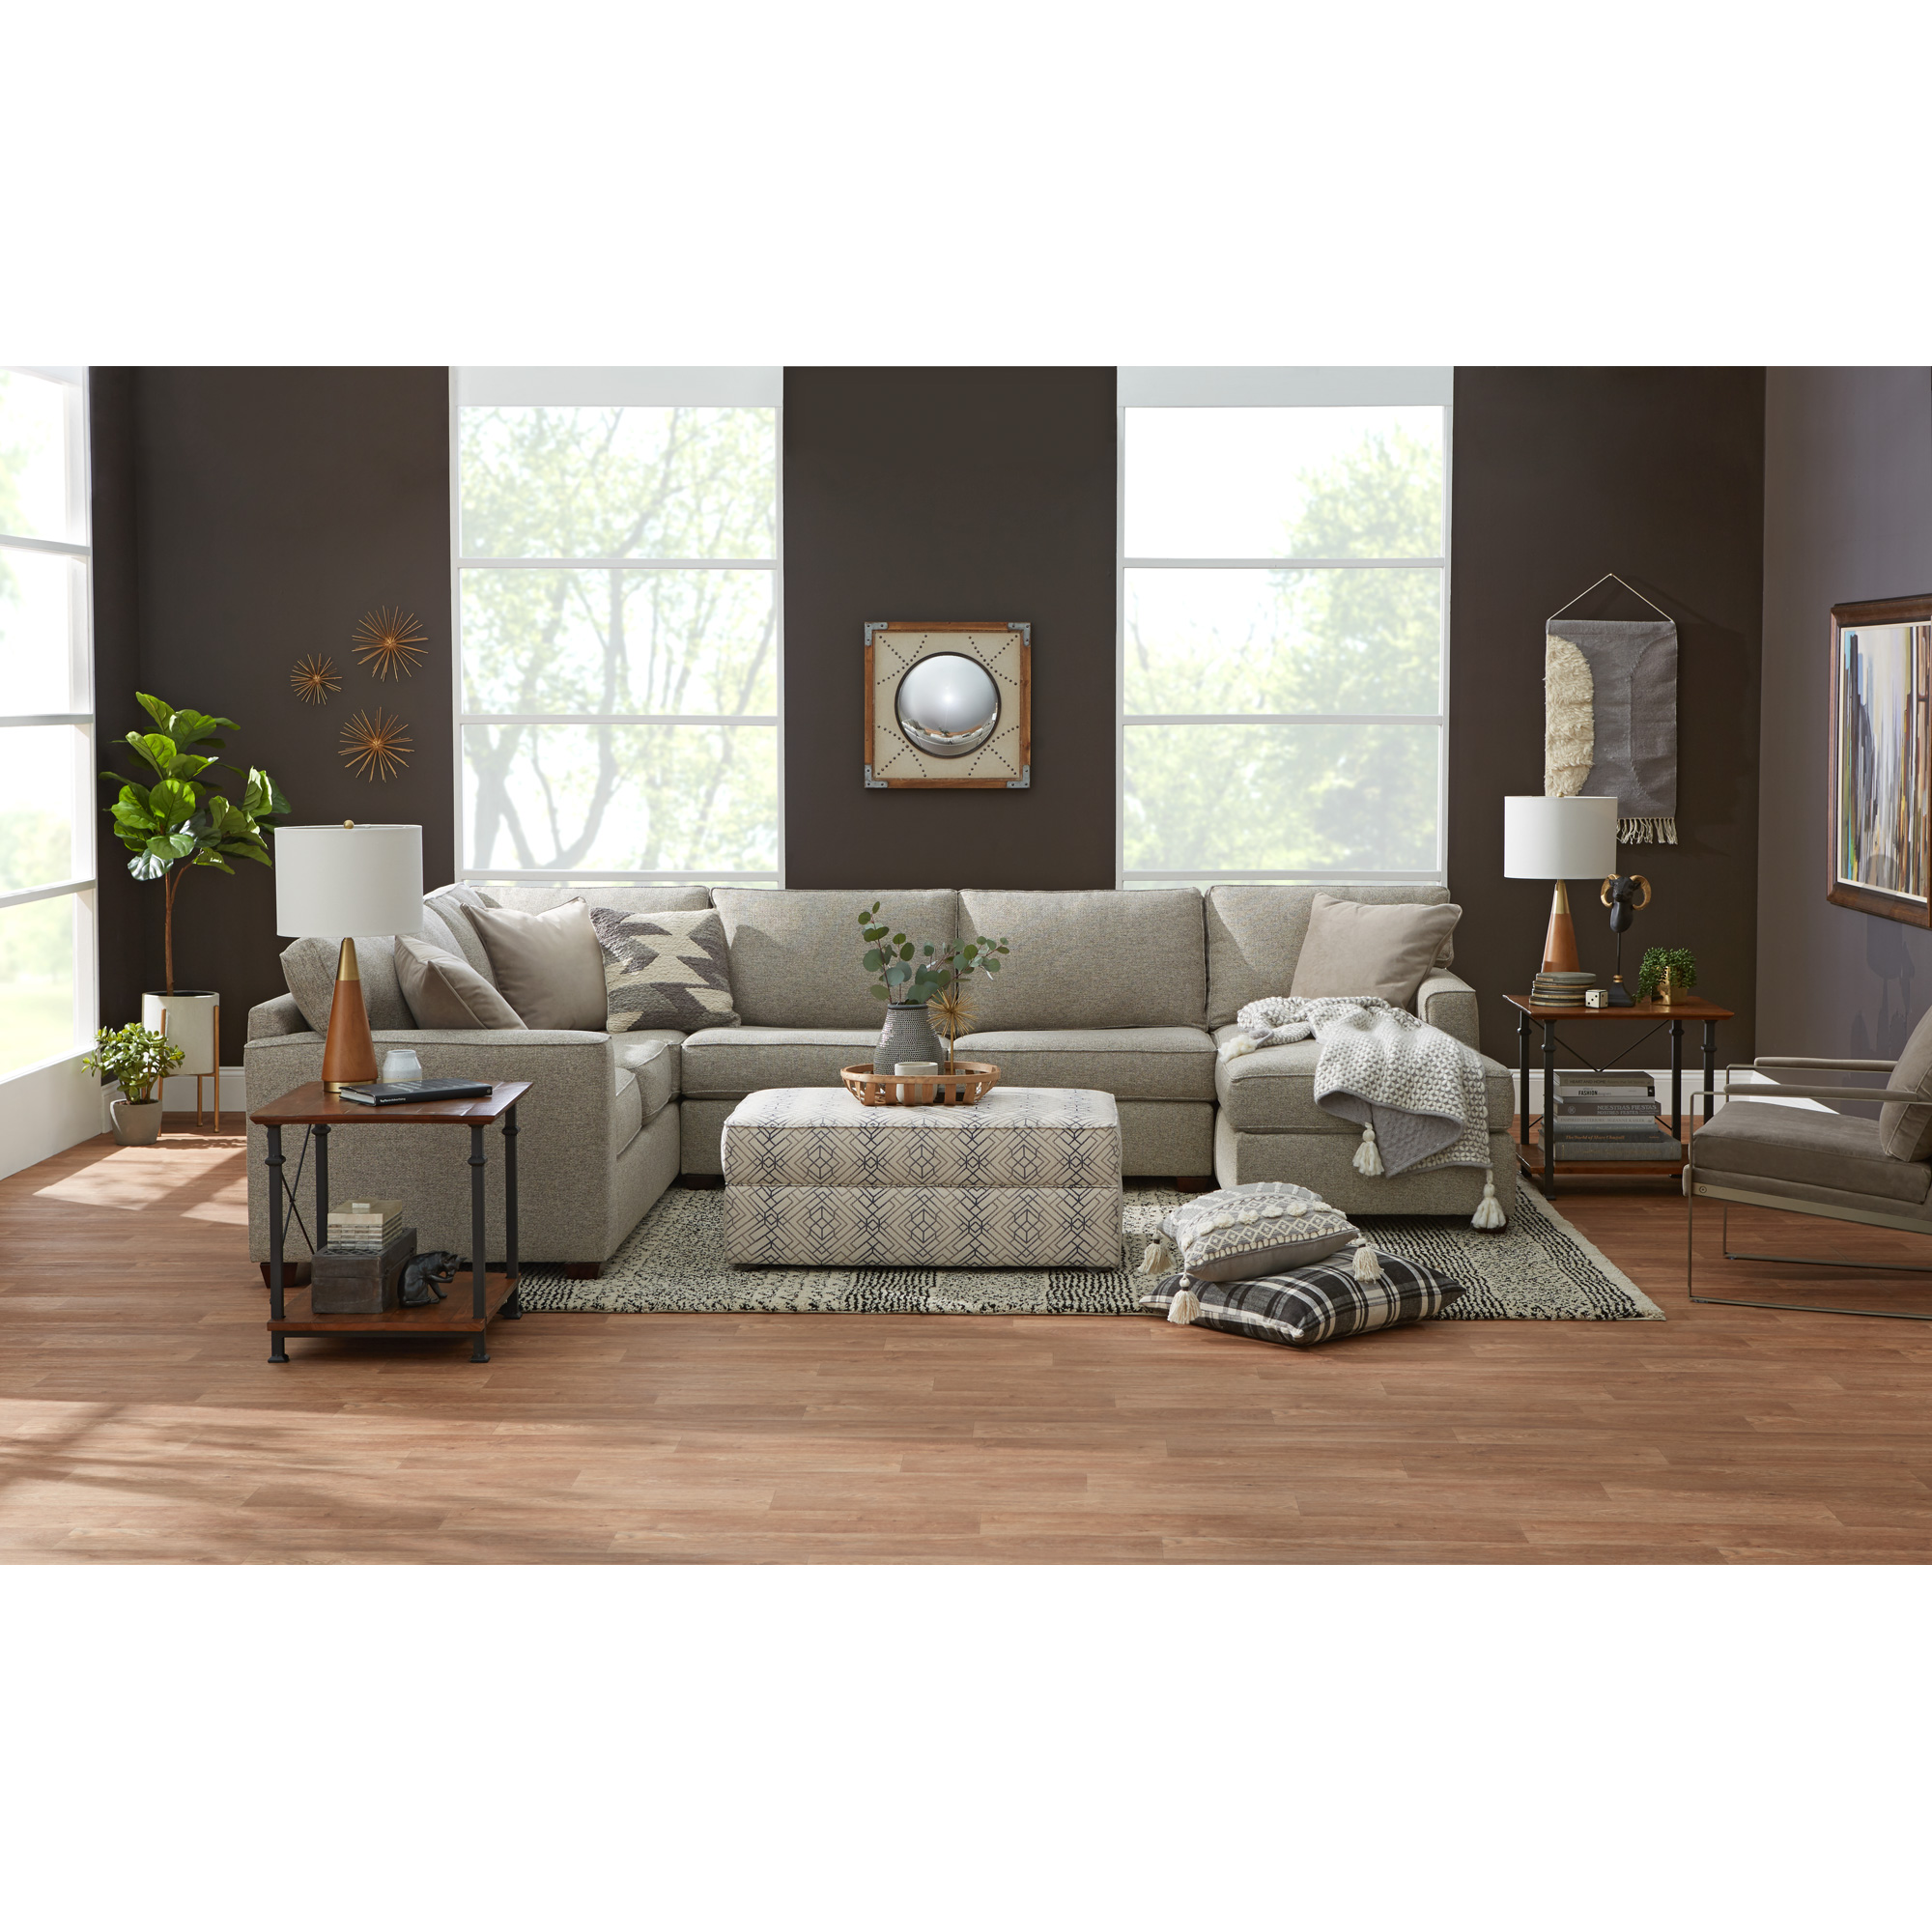 Bauhaus Furniture   Rise Gray 3 Piece Right Sectional Sofa